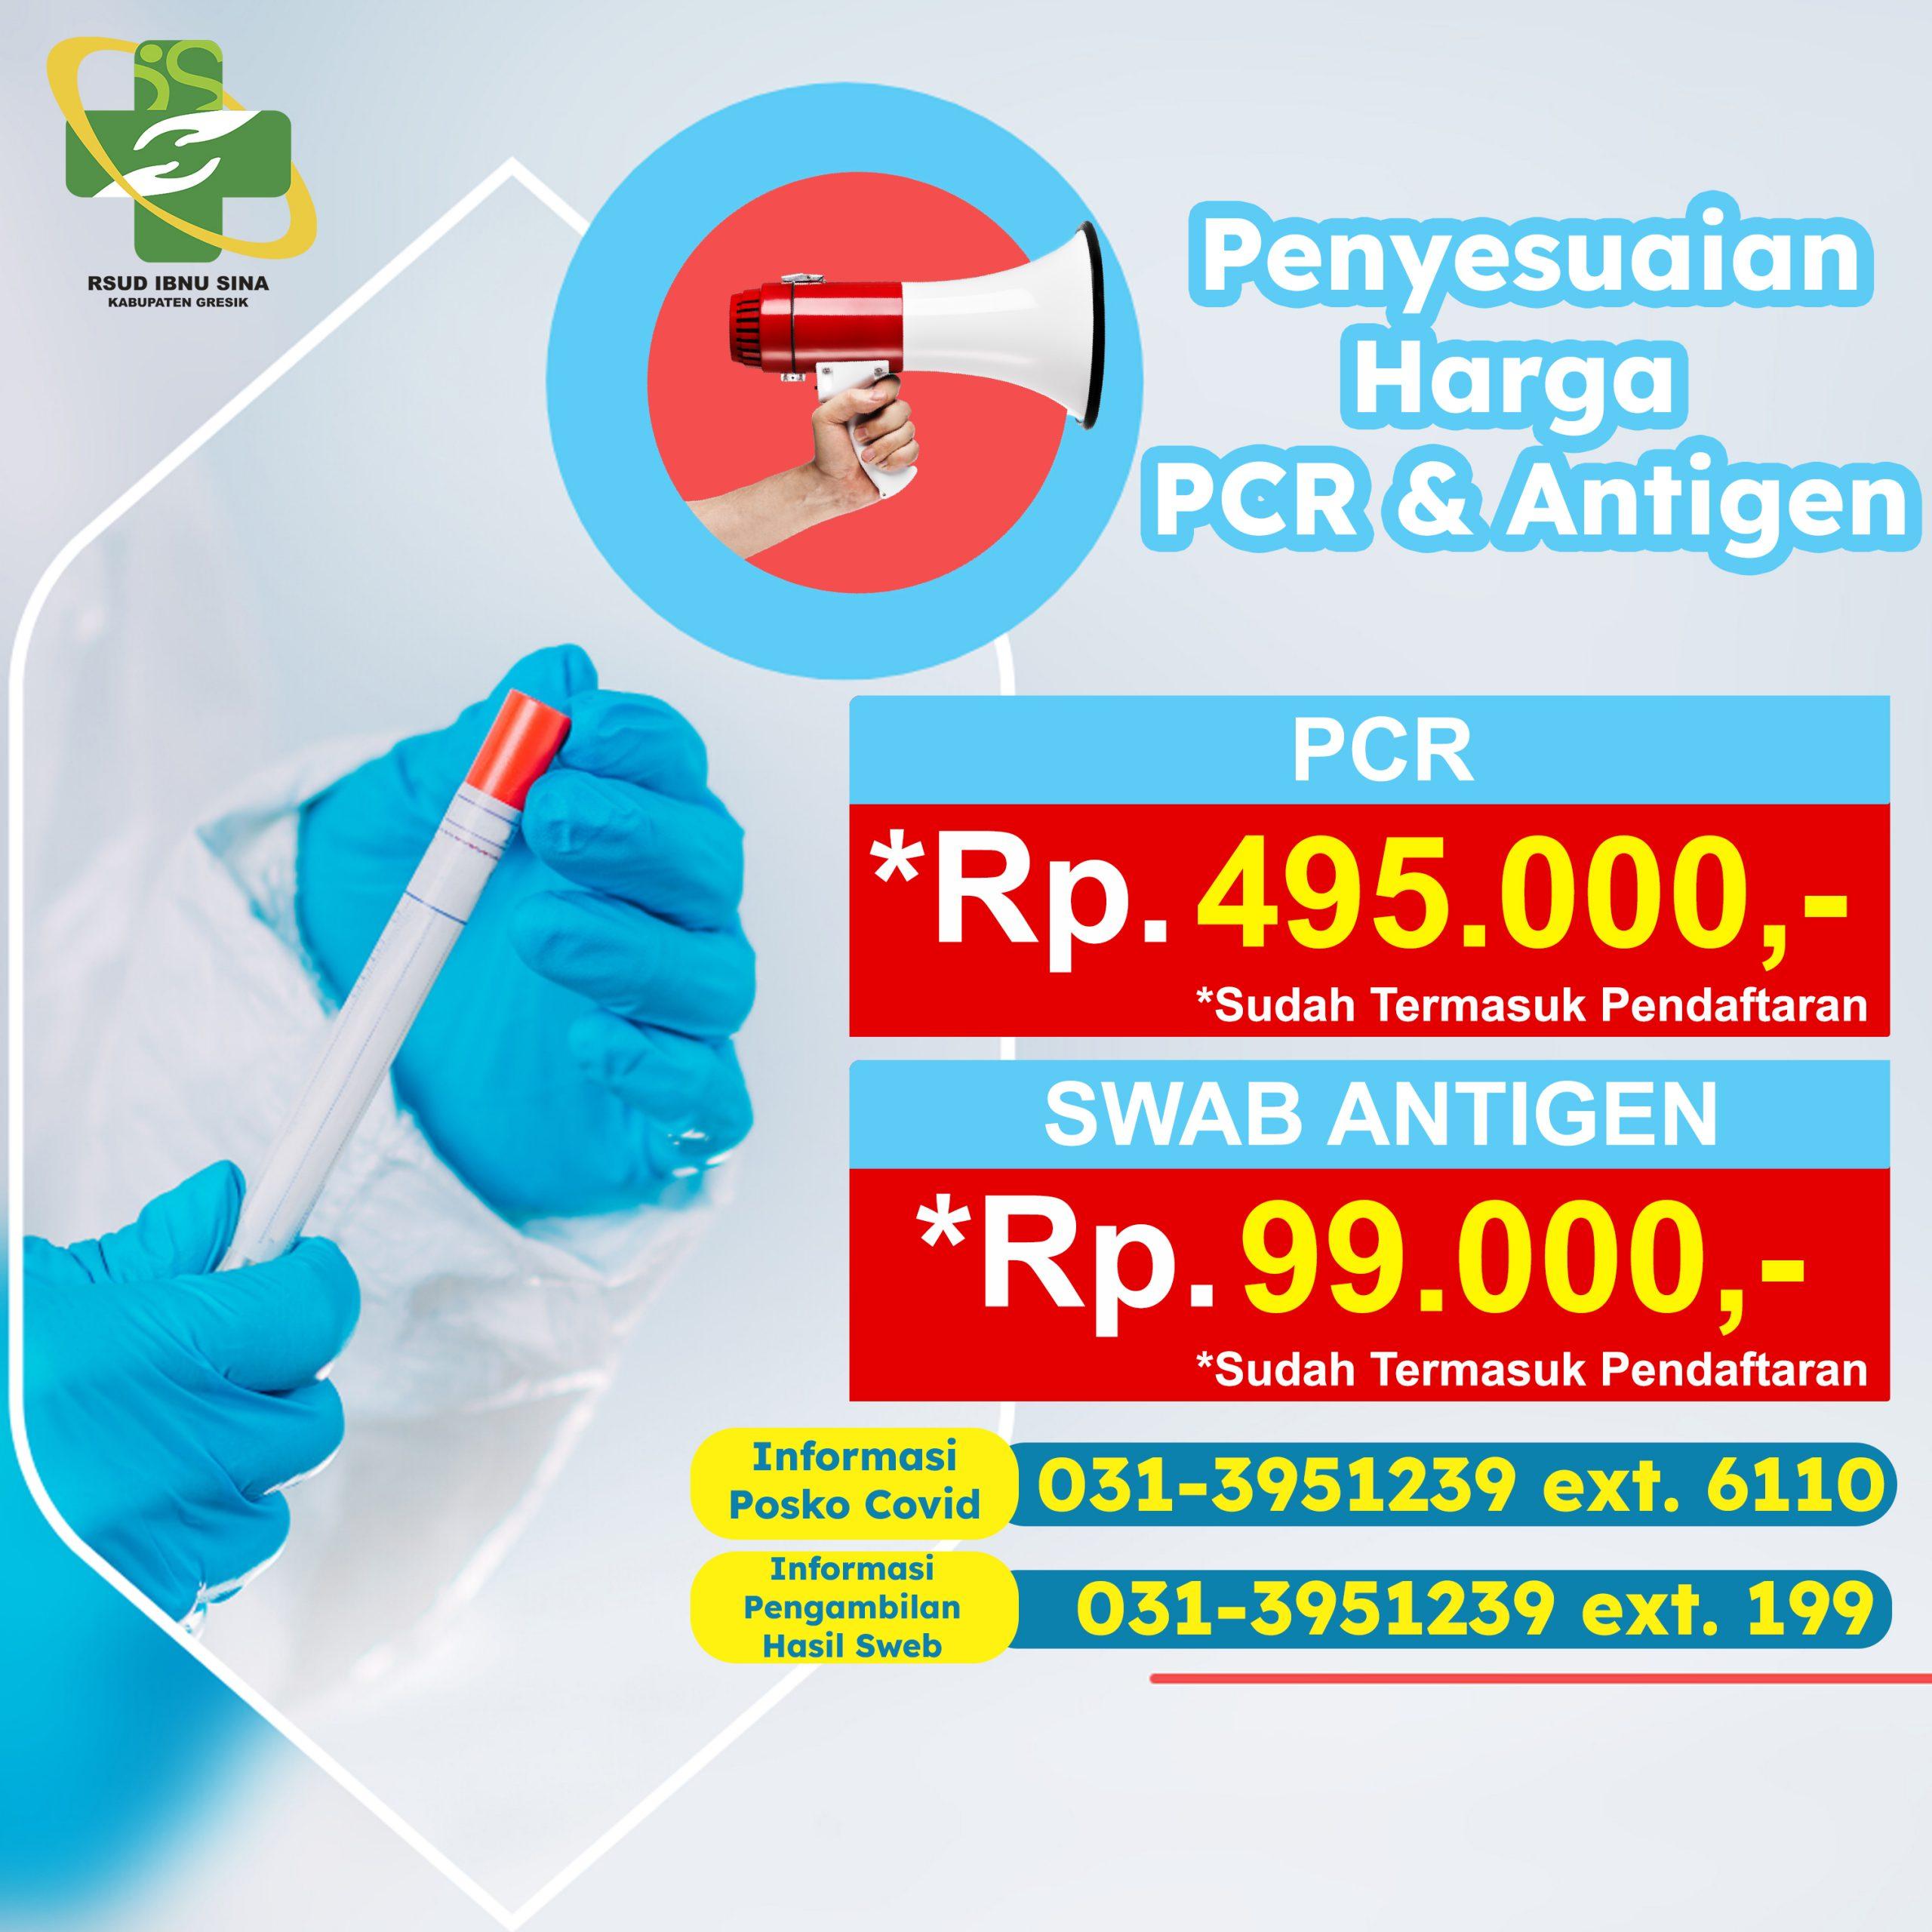 Harga Penyesuaian PCR & Antigen